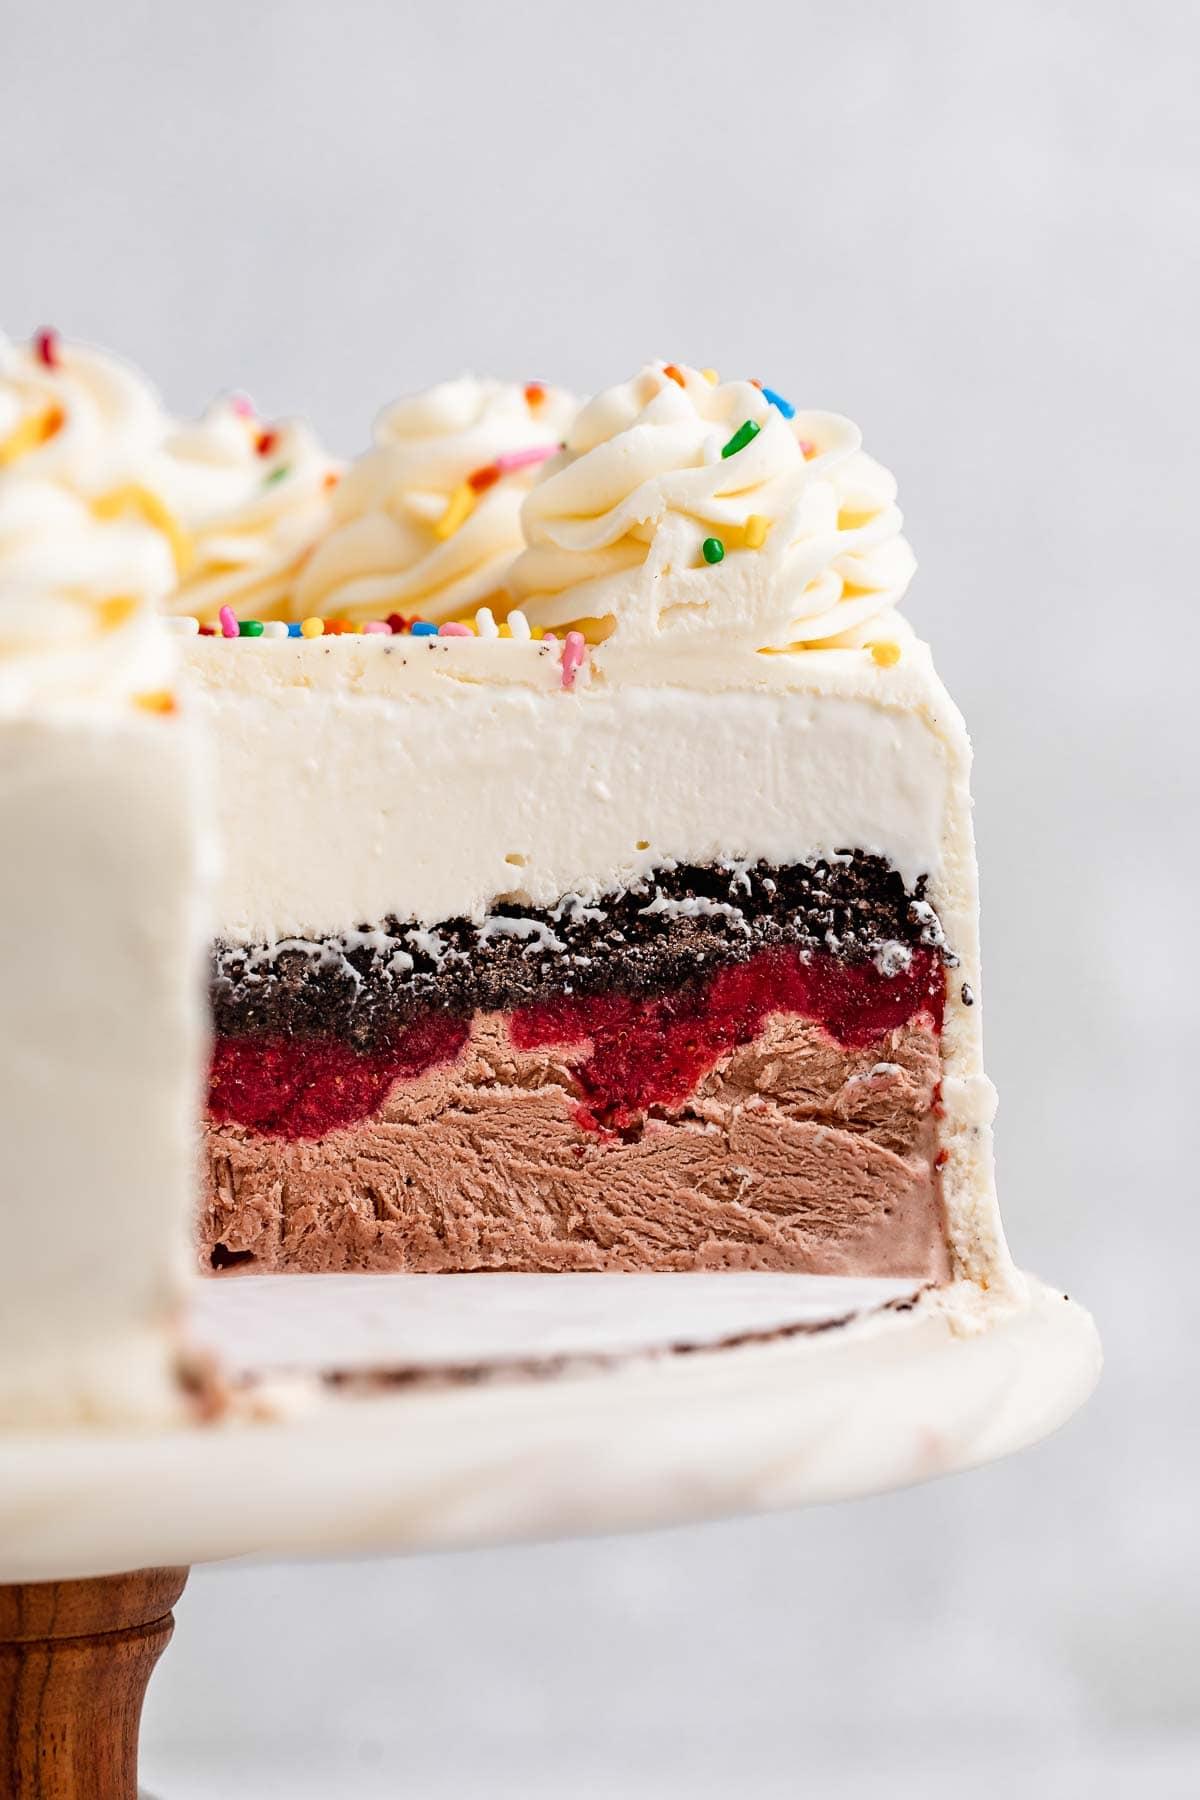 Ice Cream Cake with slice missing